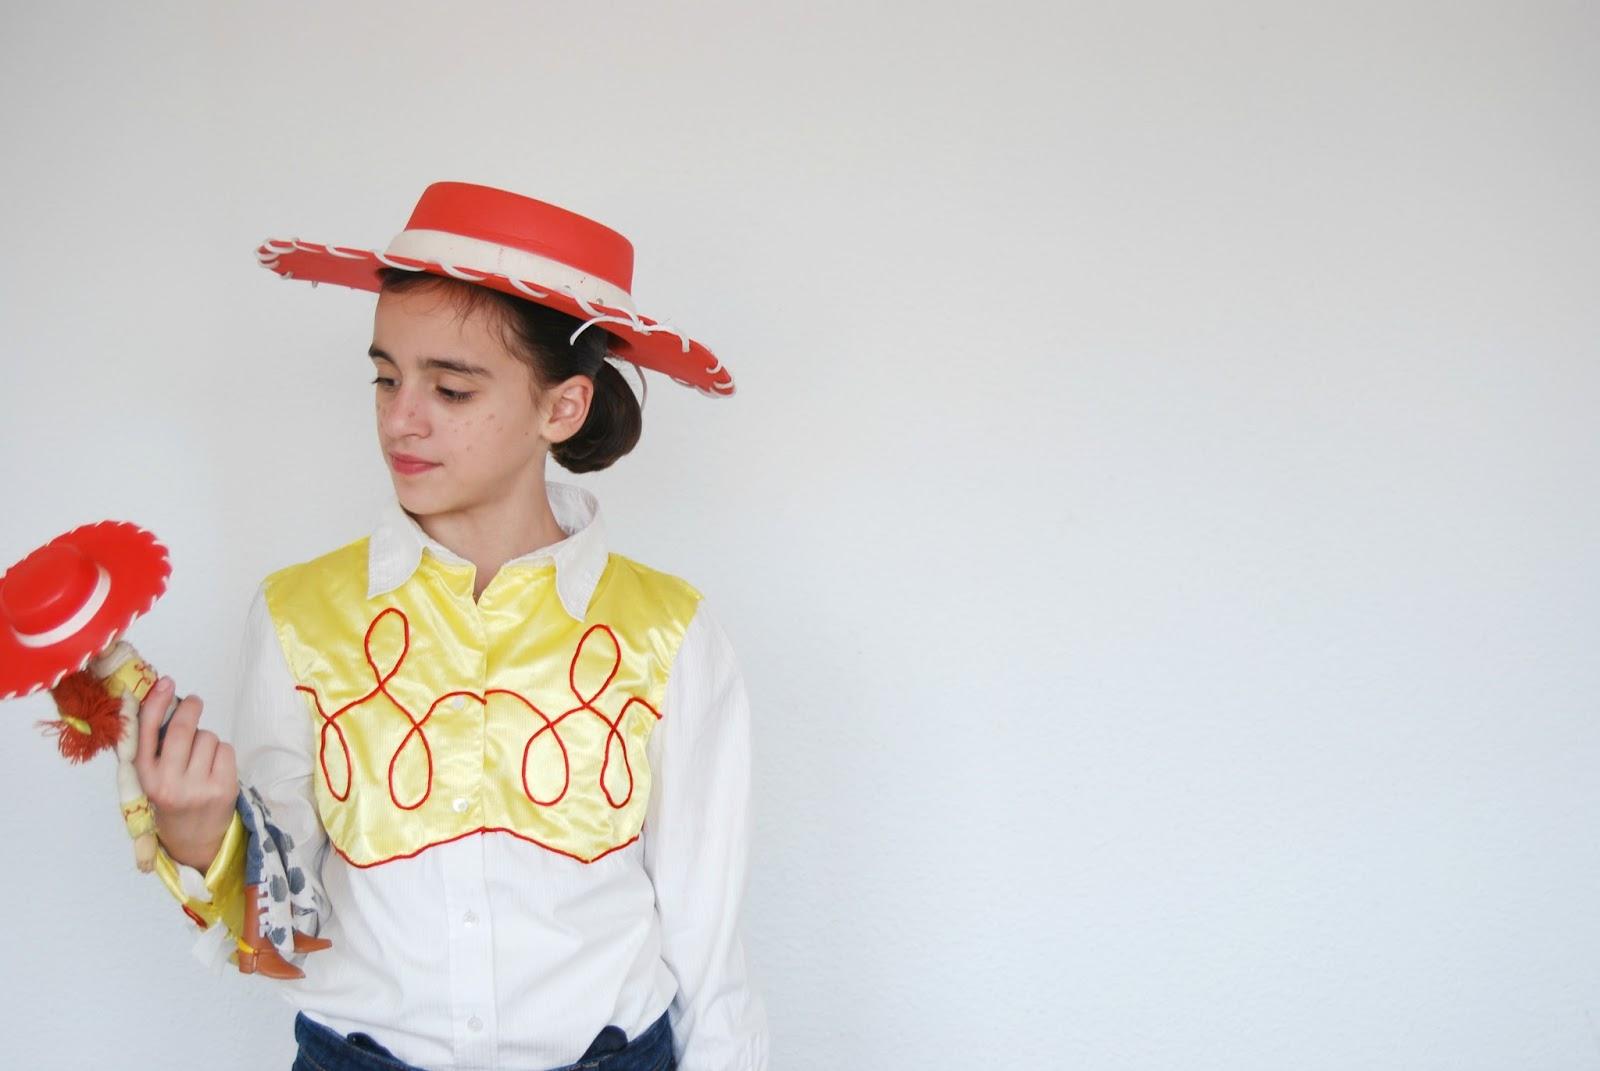 86a43860c10cb disfraz Jessie la vaquera hecho en casa. Handmade Jessie from Toy Story  costume